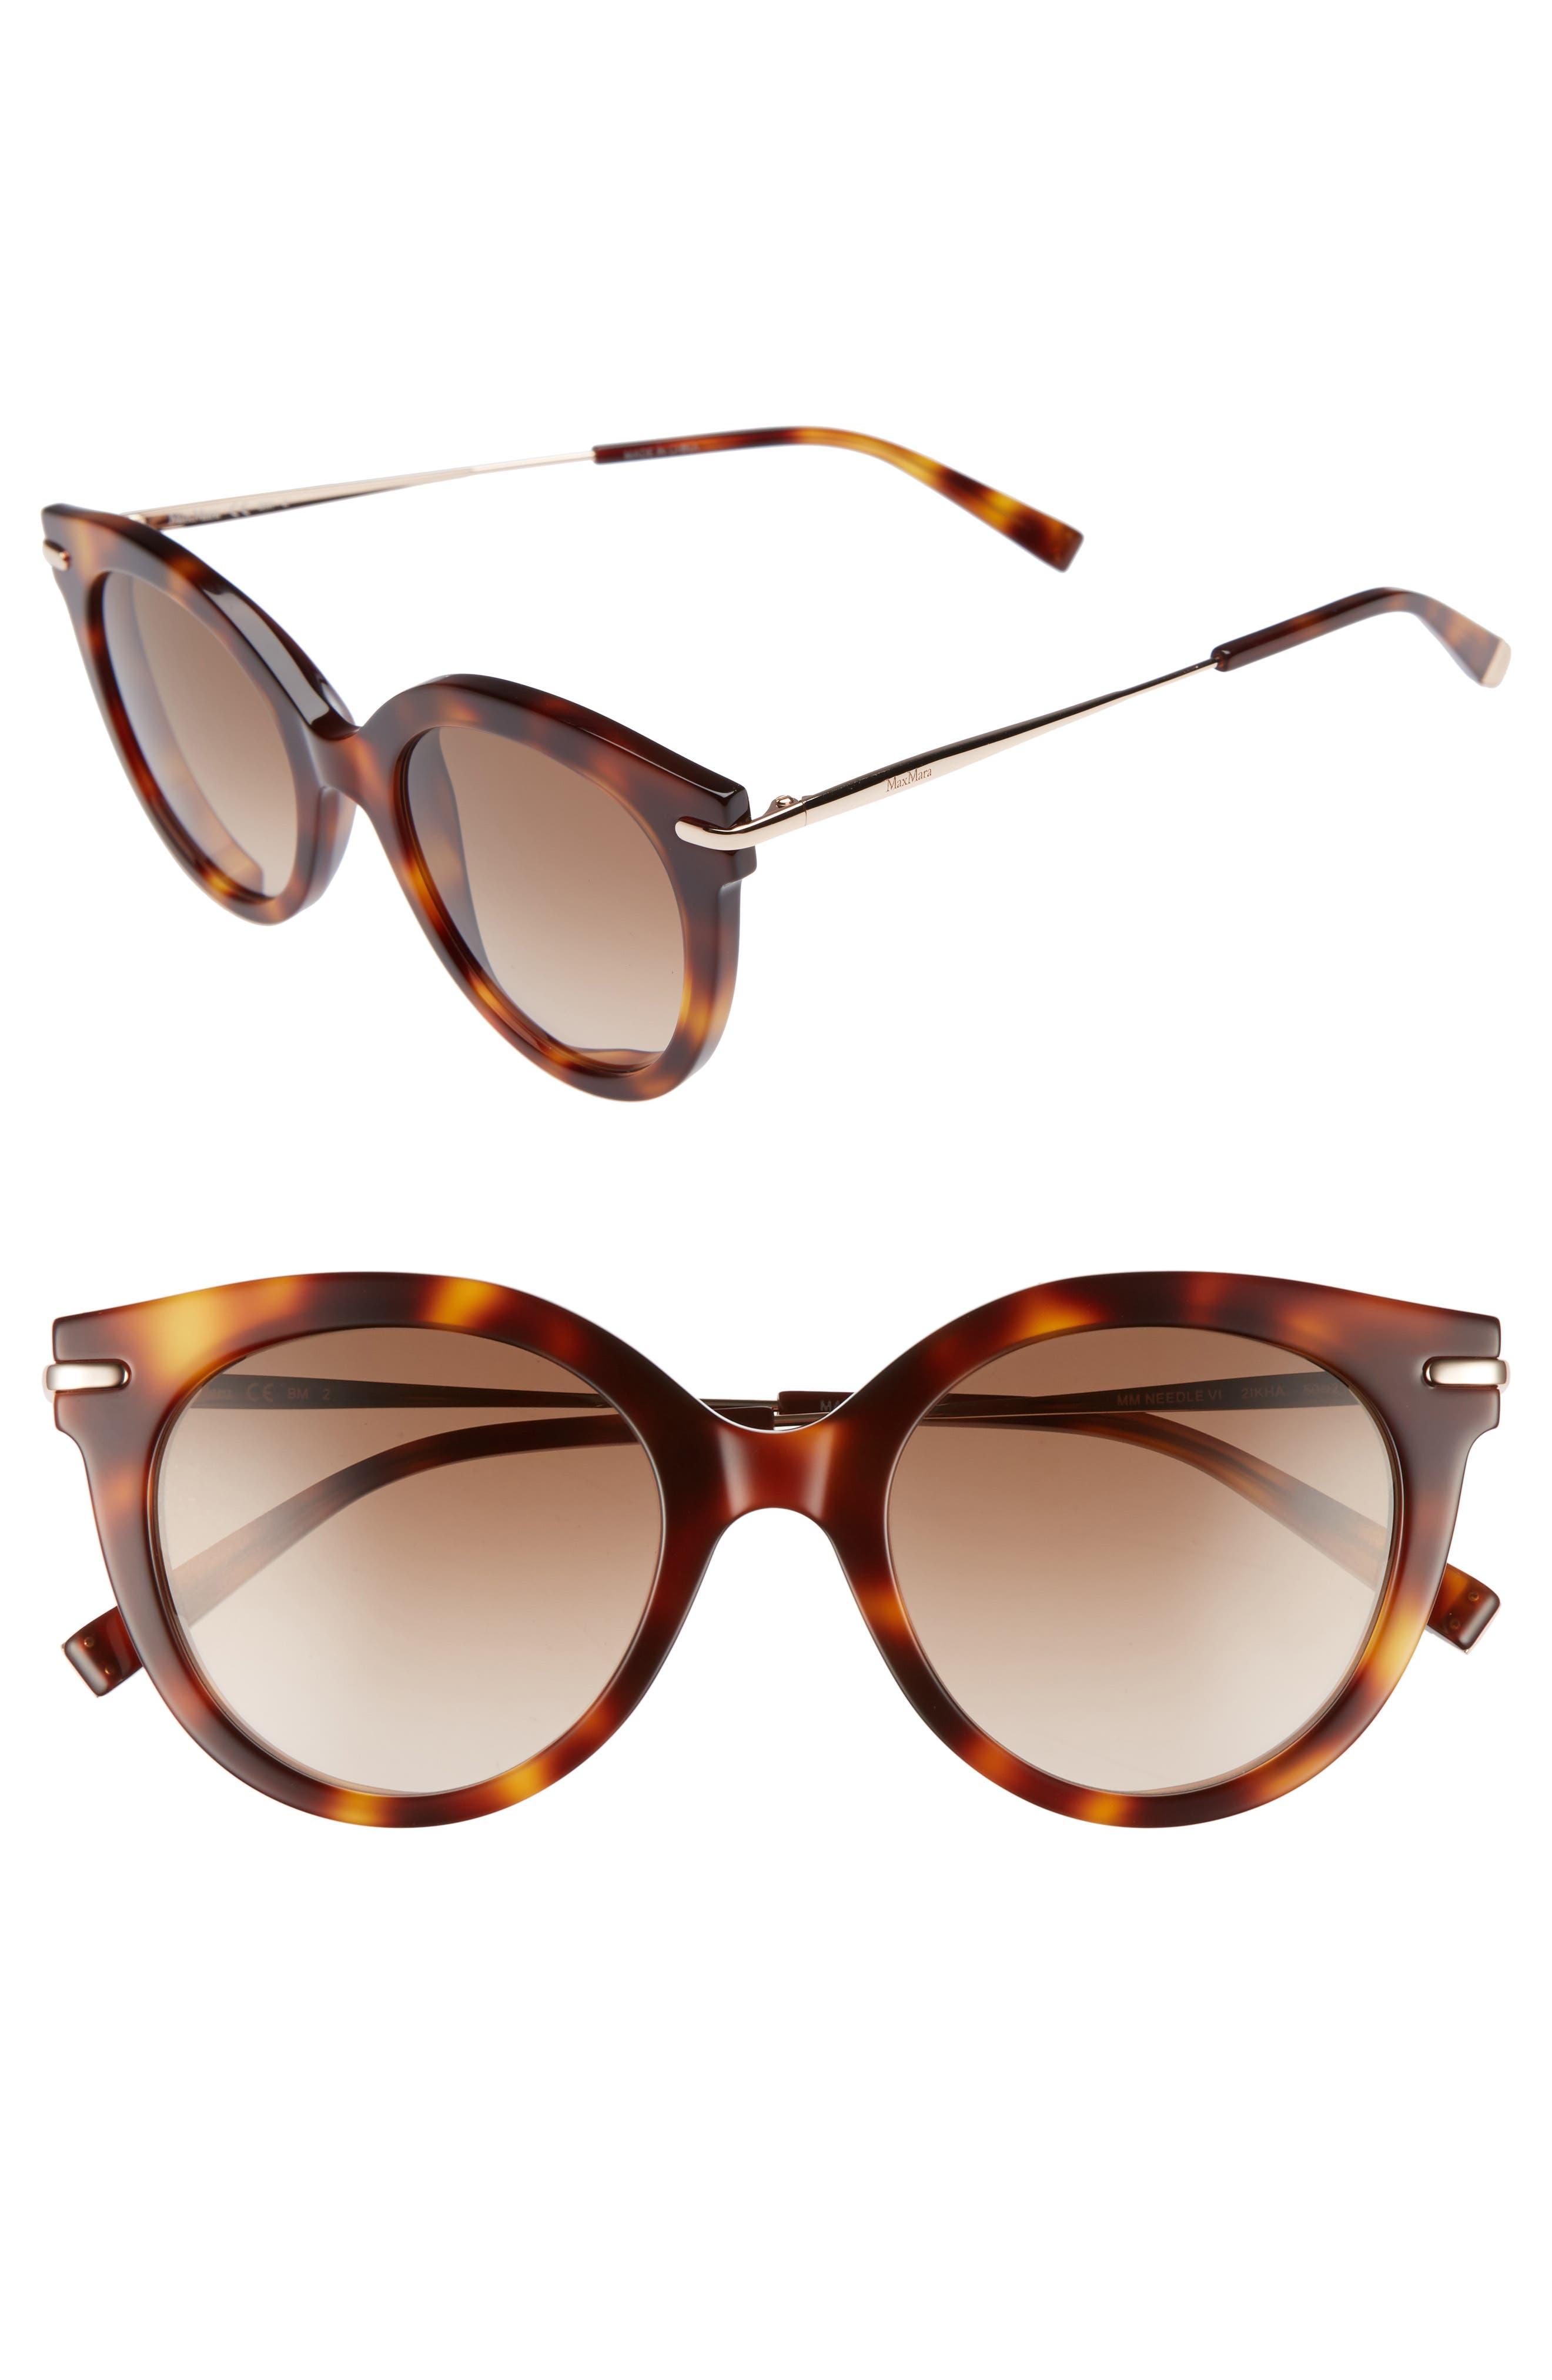 Alternate Image 1 Selected - Max Mara Needle VI 50mm Gradient Round Sunglasses